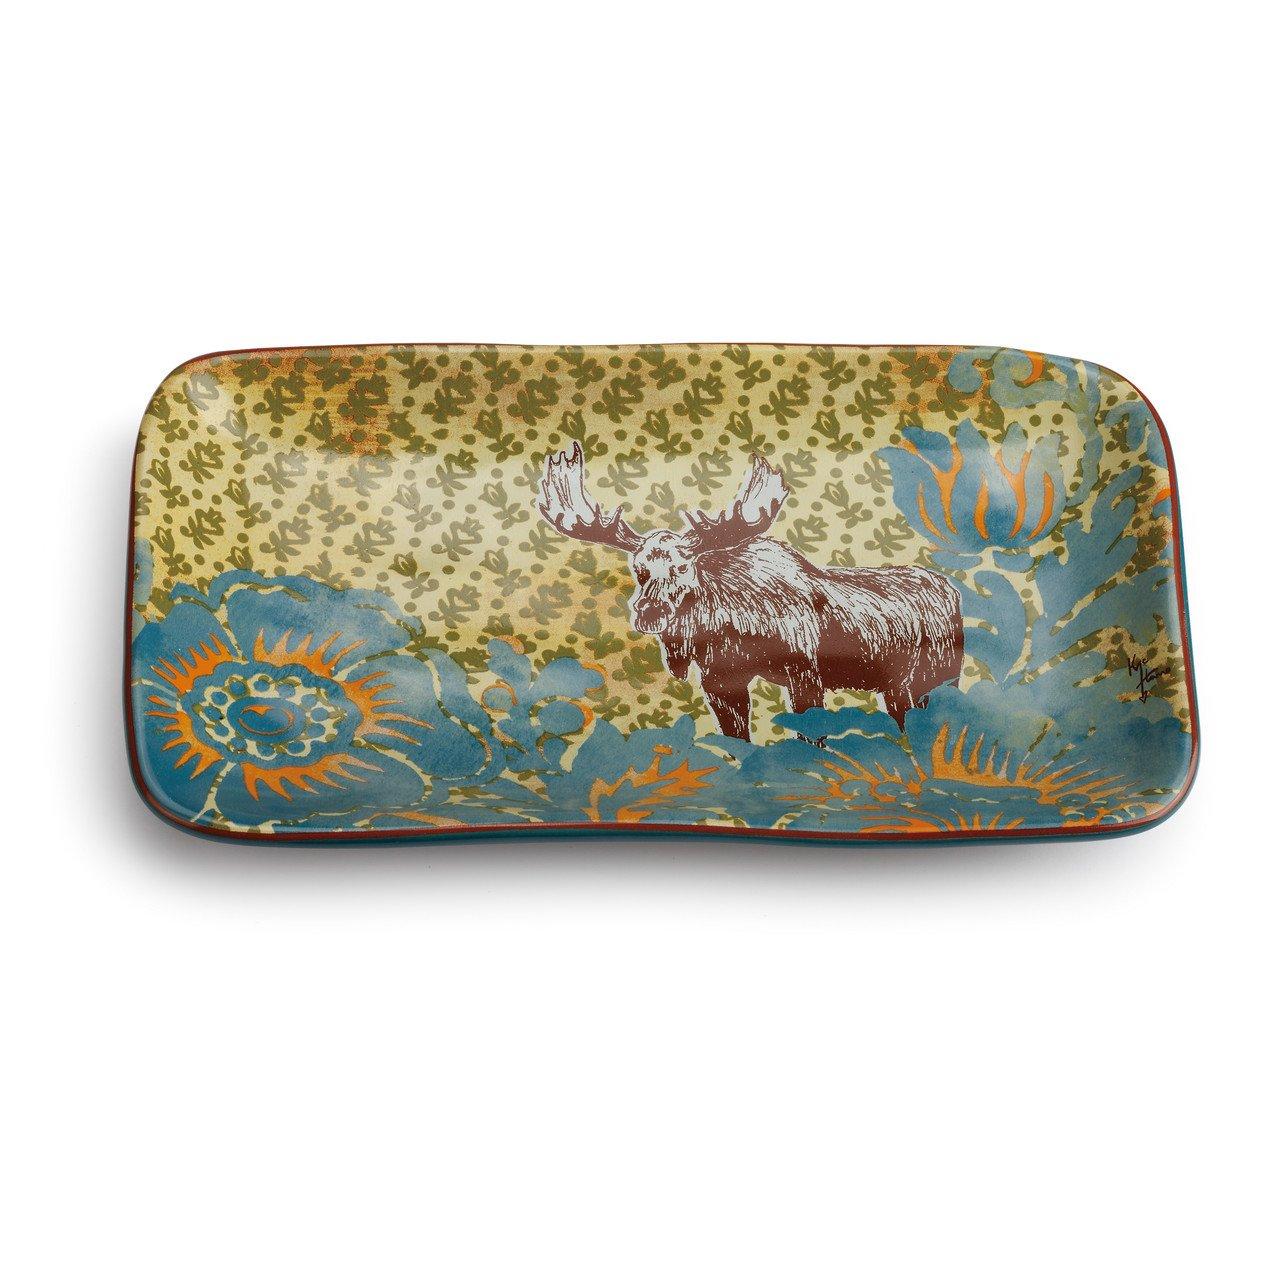 Big Sky Carvers Harros Moose Pattern Snack Plate, Multicolor